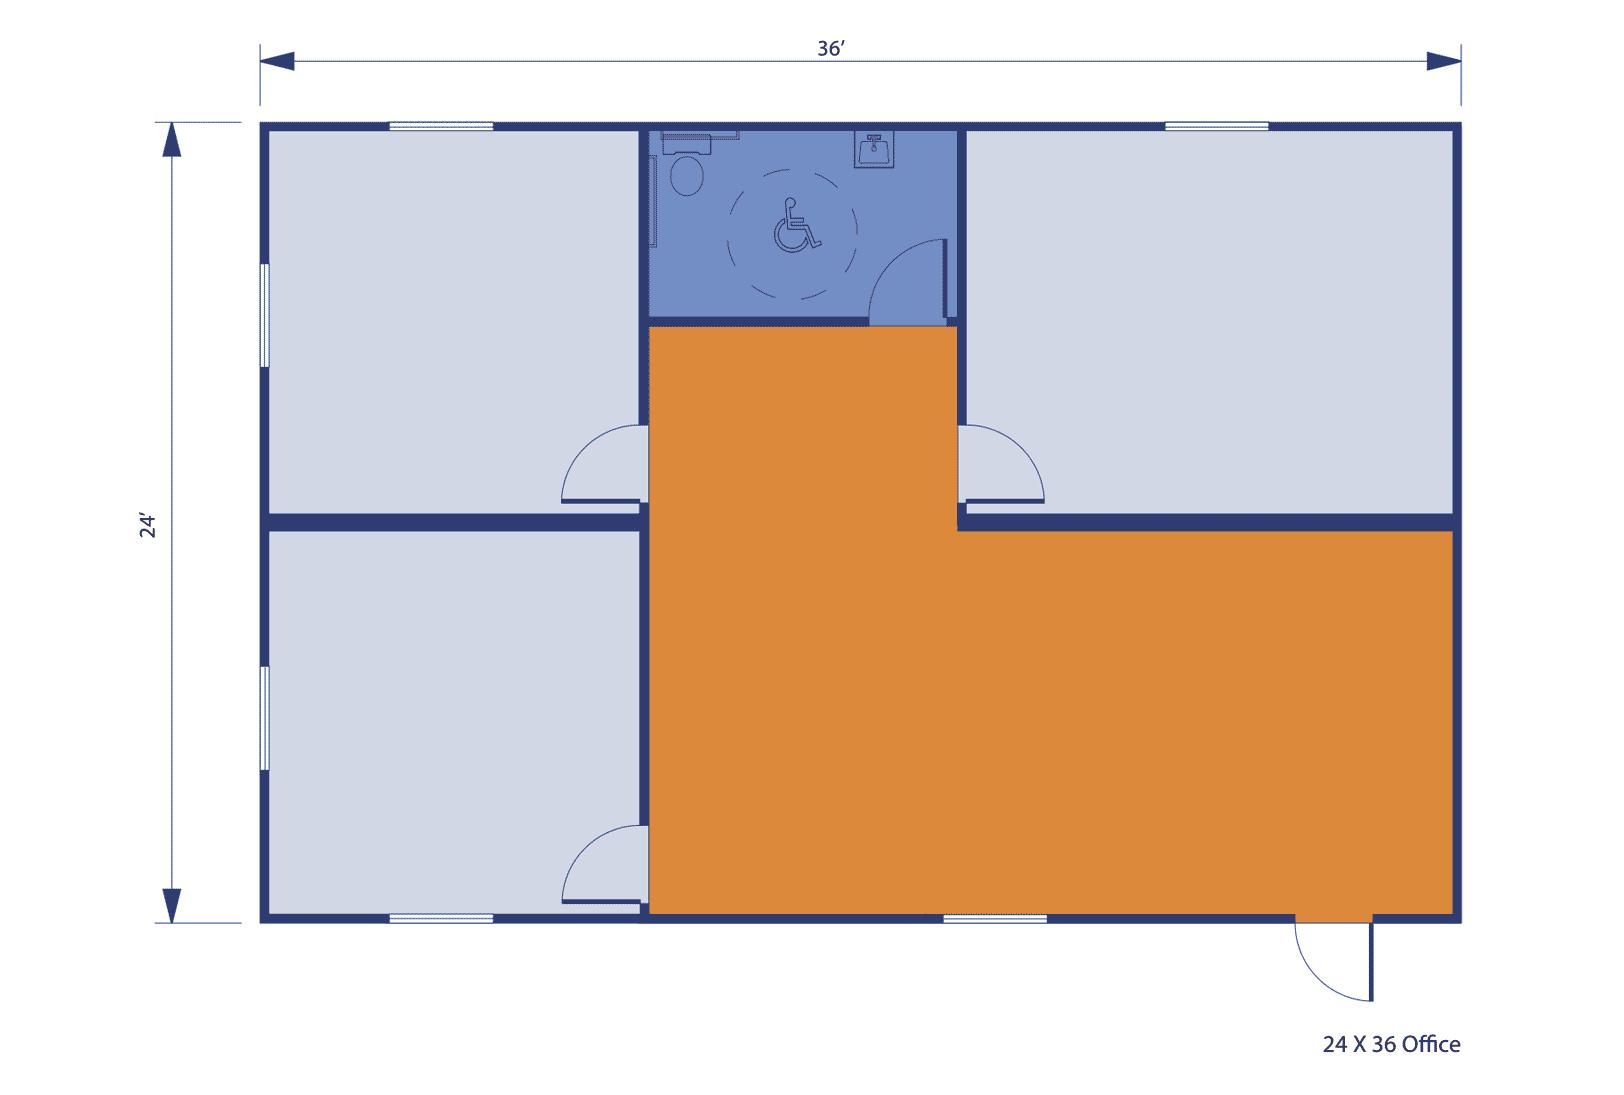 24'x36' Double-Wide Modular Office floorplan